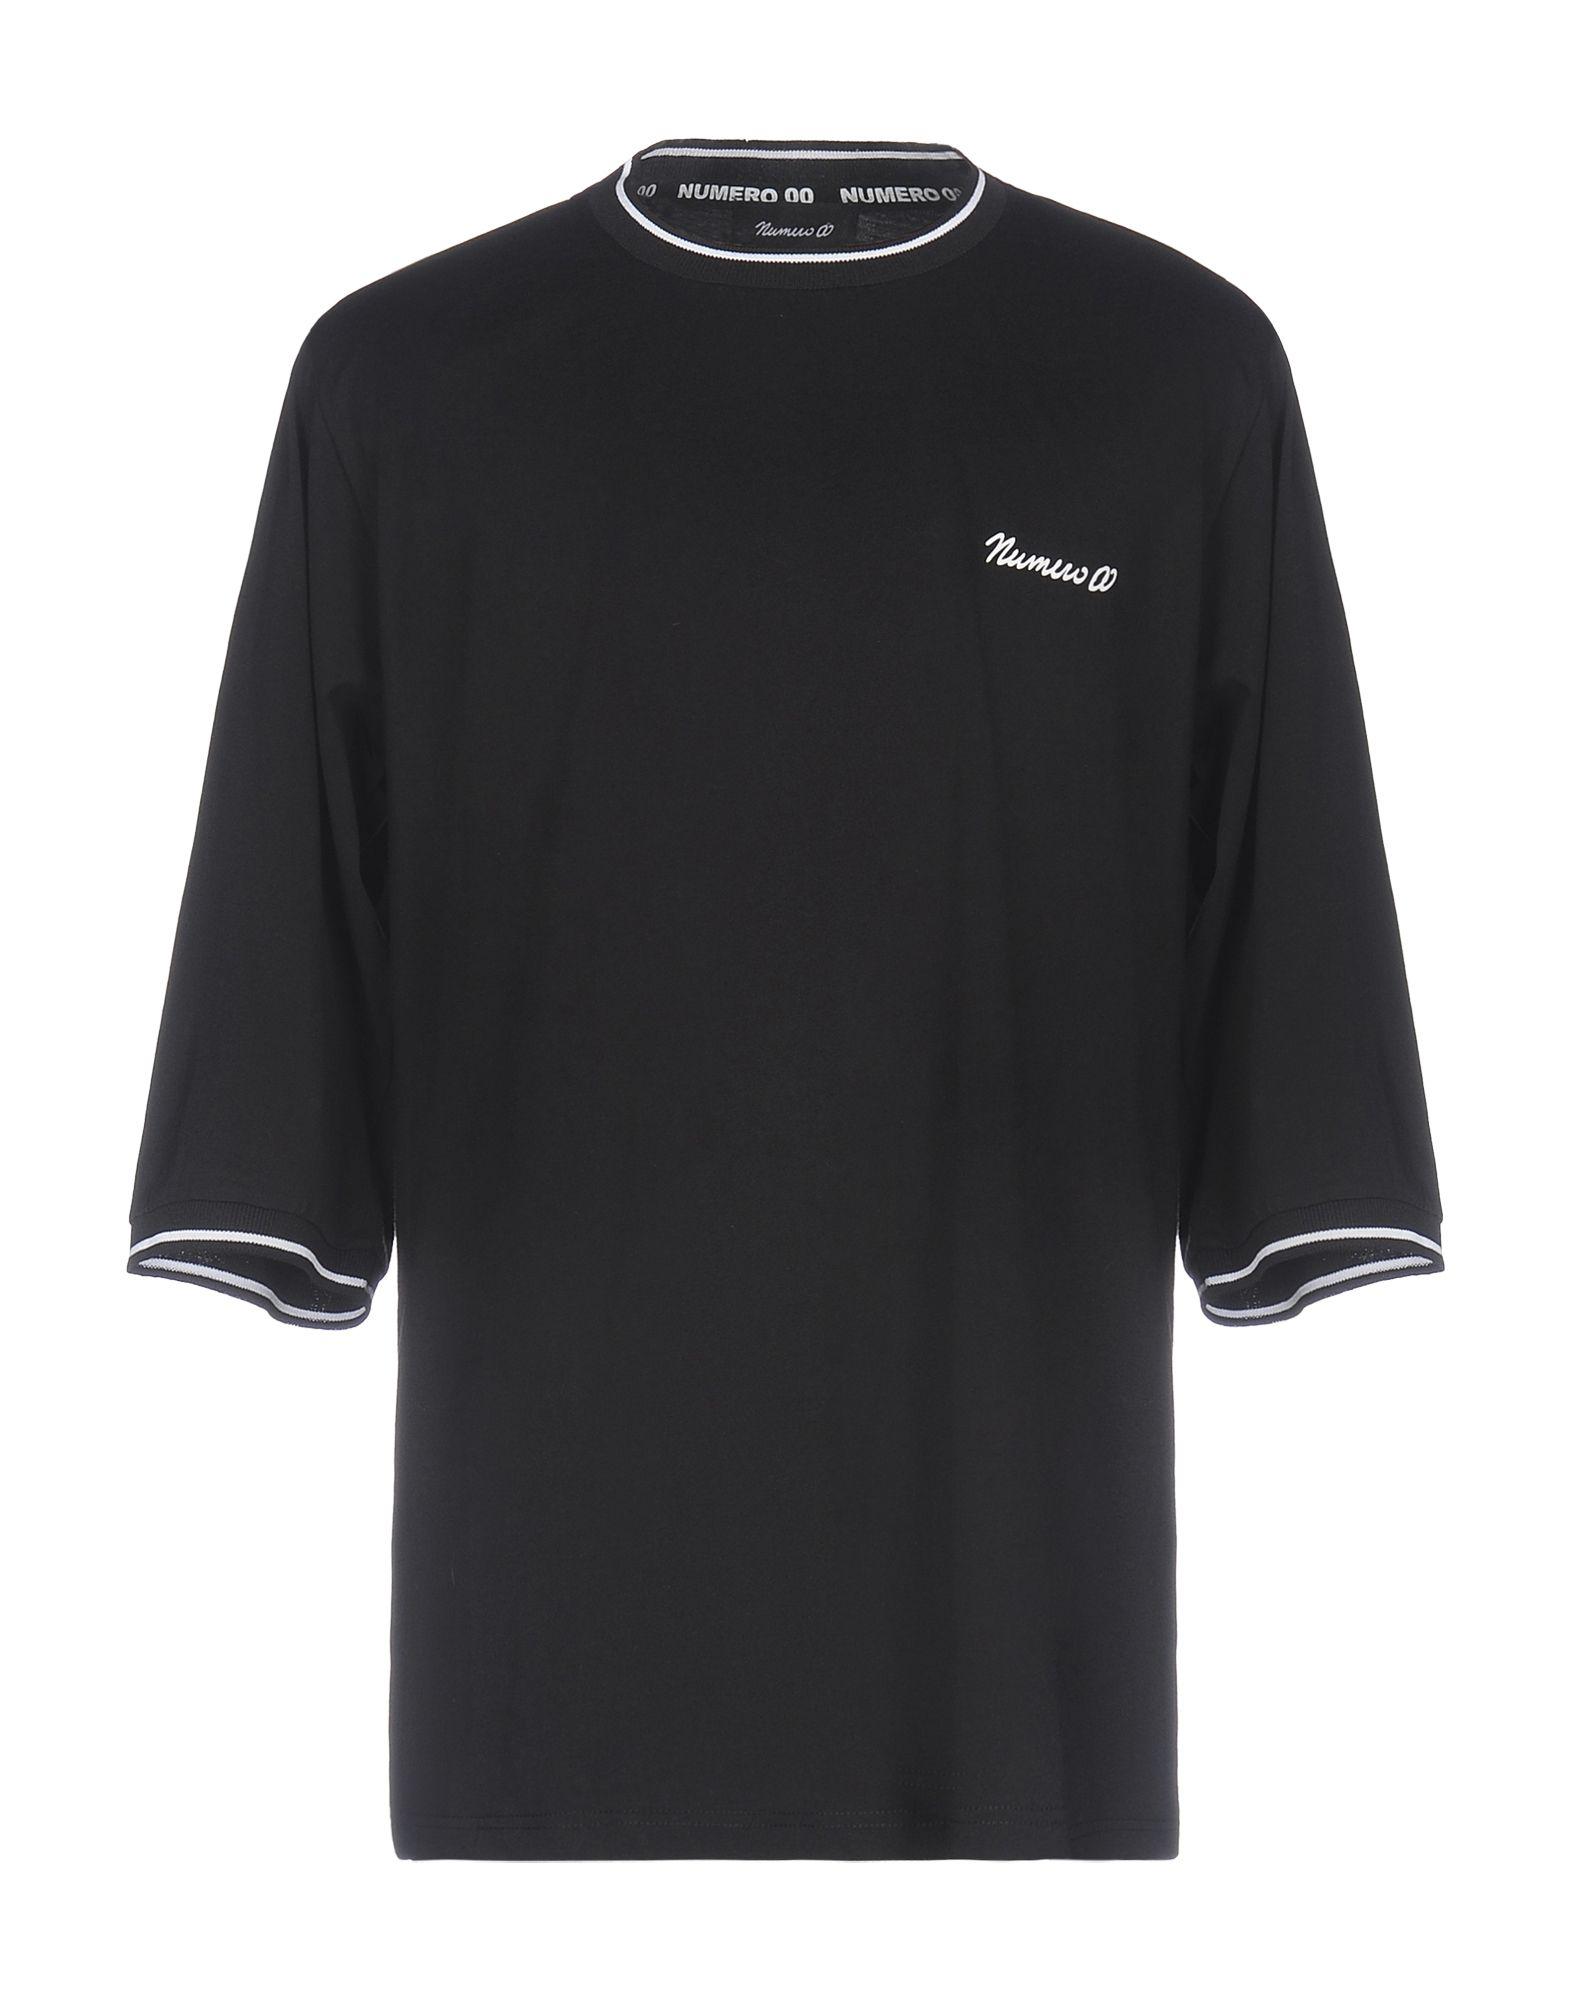 T-Shirt Numero 00 00 00 uomo - 12020525PW c18